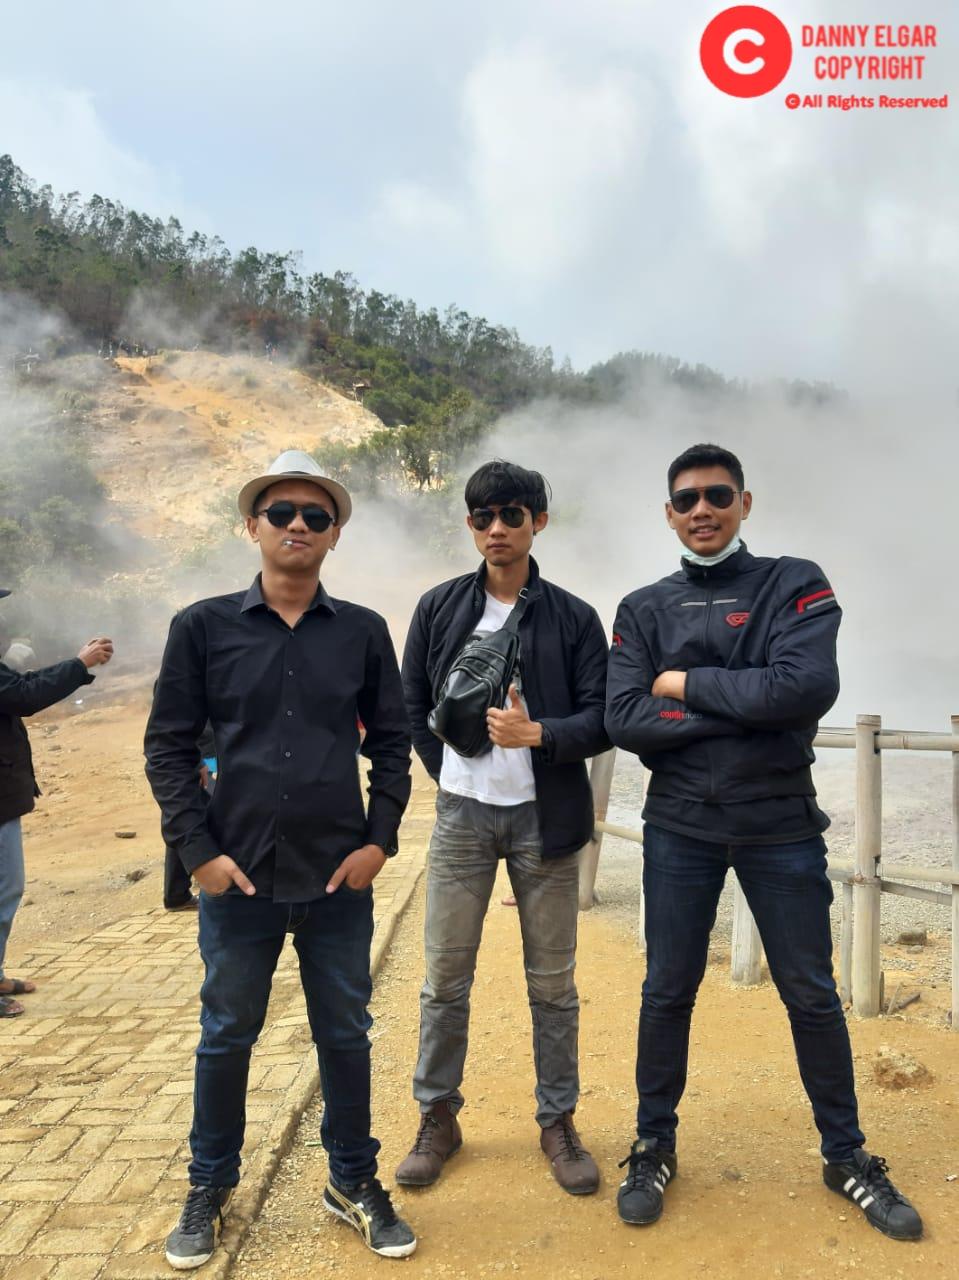 Danny Gaida Tera ELgar, Hendy Setiawan, Bayu Prasetyo Aji